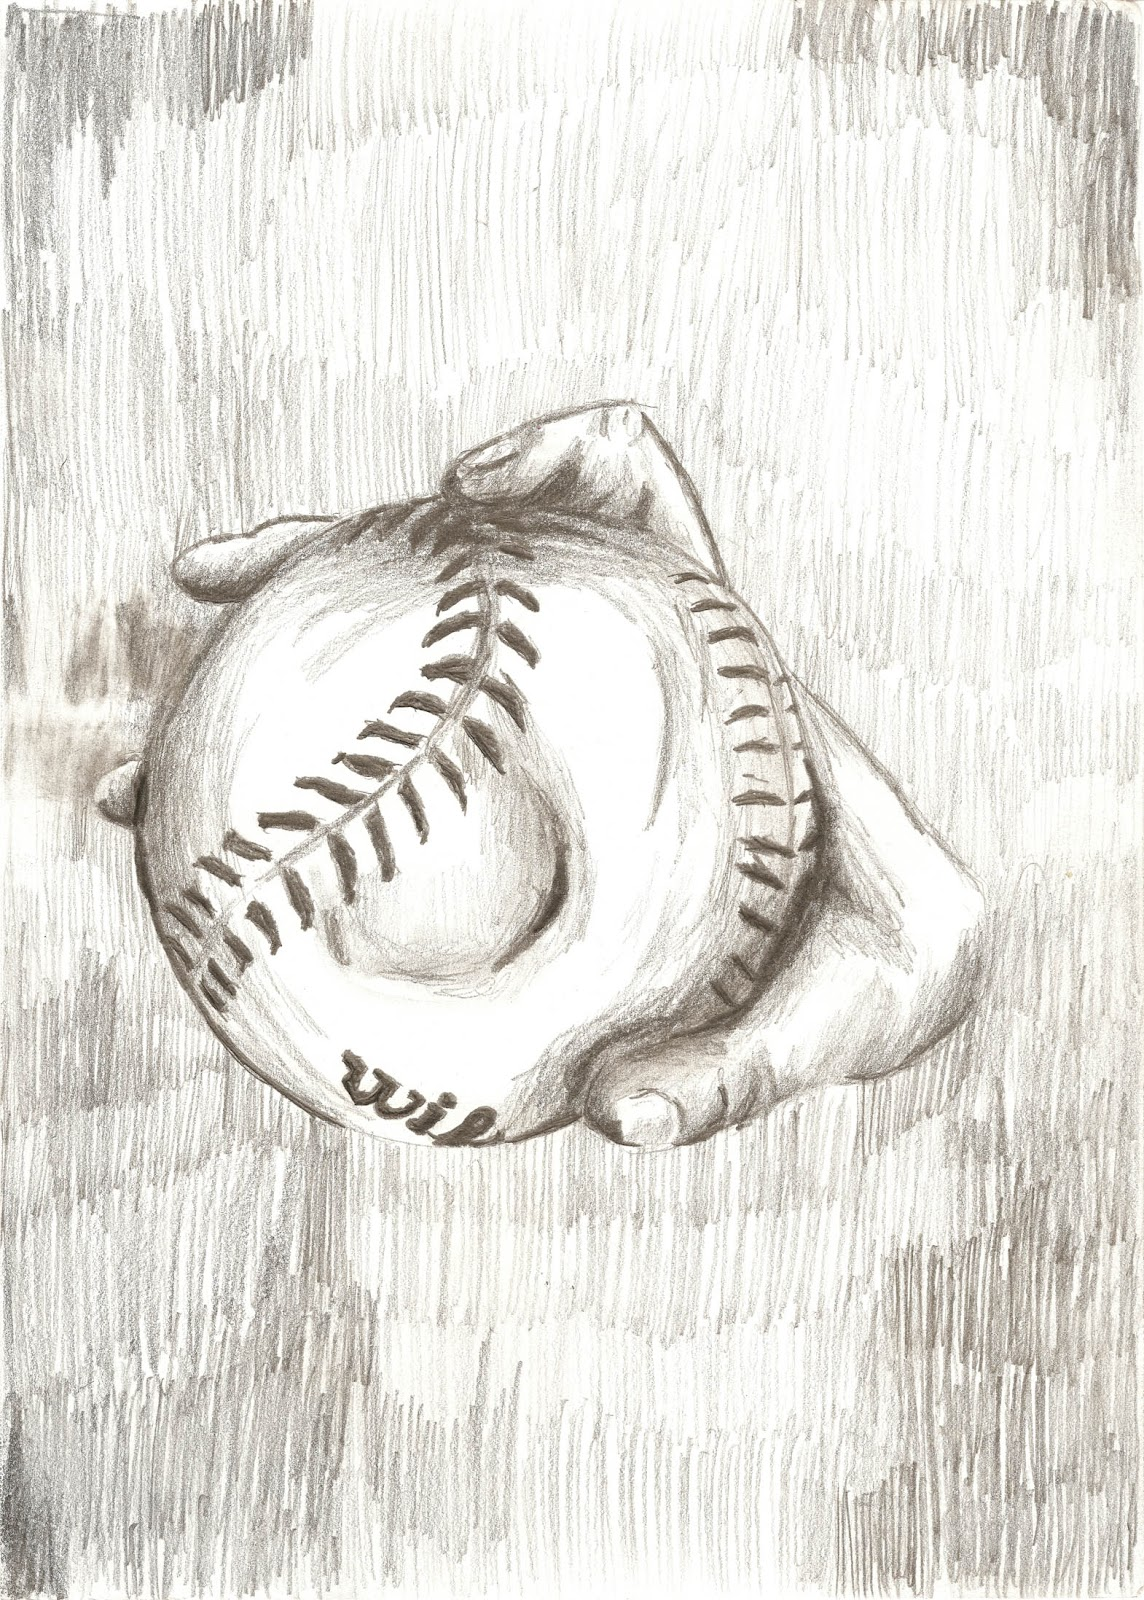 Softball pitcher drawings